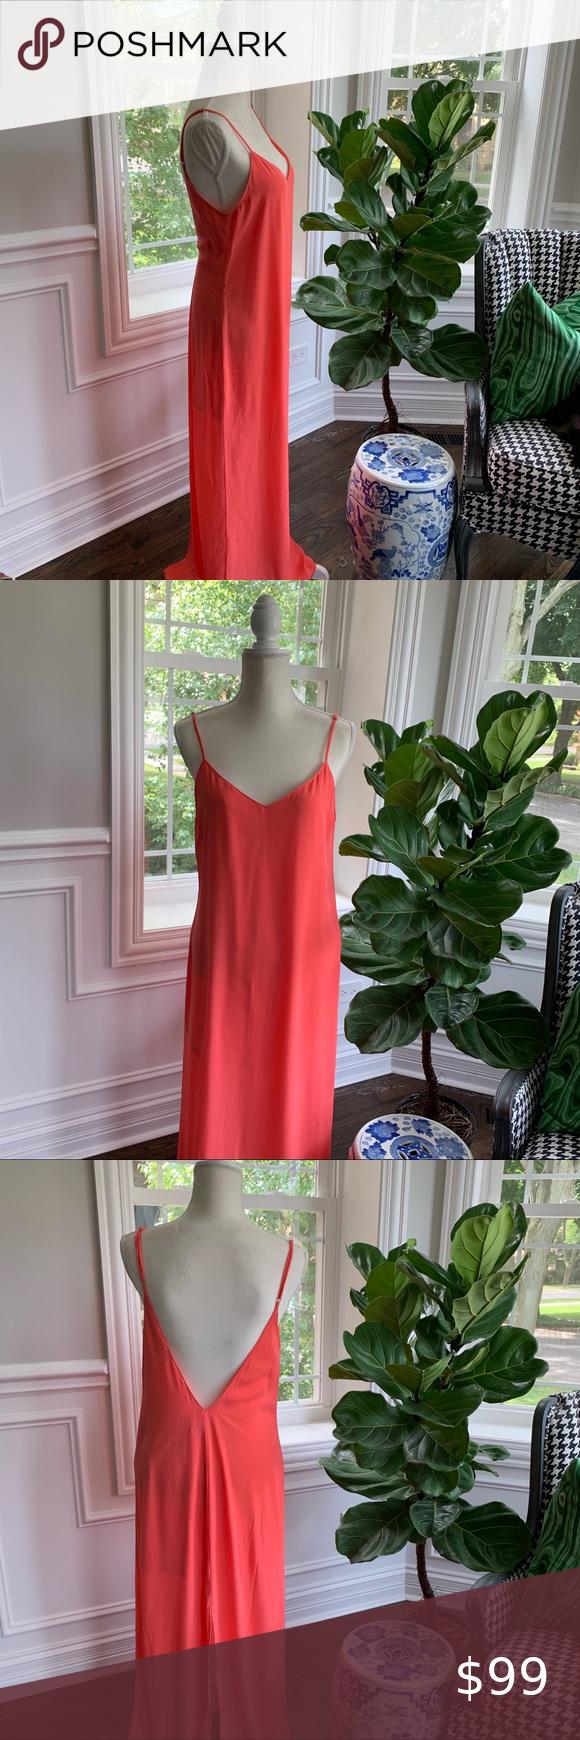 Show Me Your Mumu Jolie Maxi Dress Size S Maxi Dress Dresses Maxi [ 1740 x 580 Pixel ]